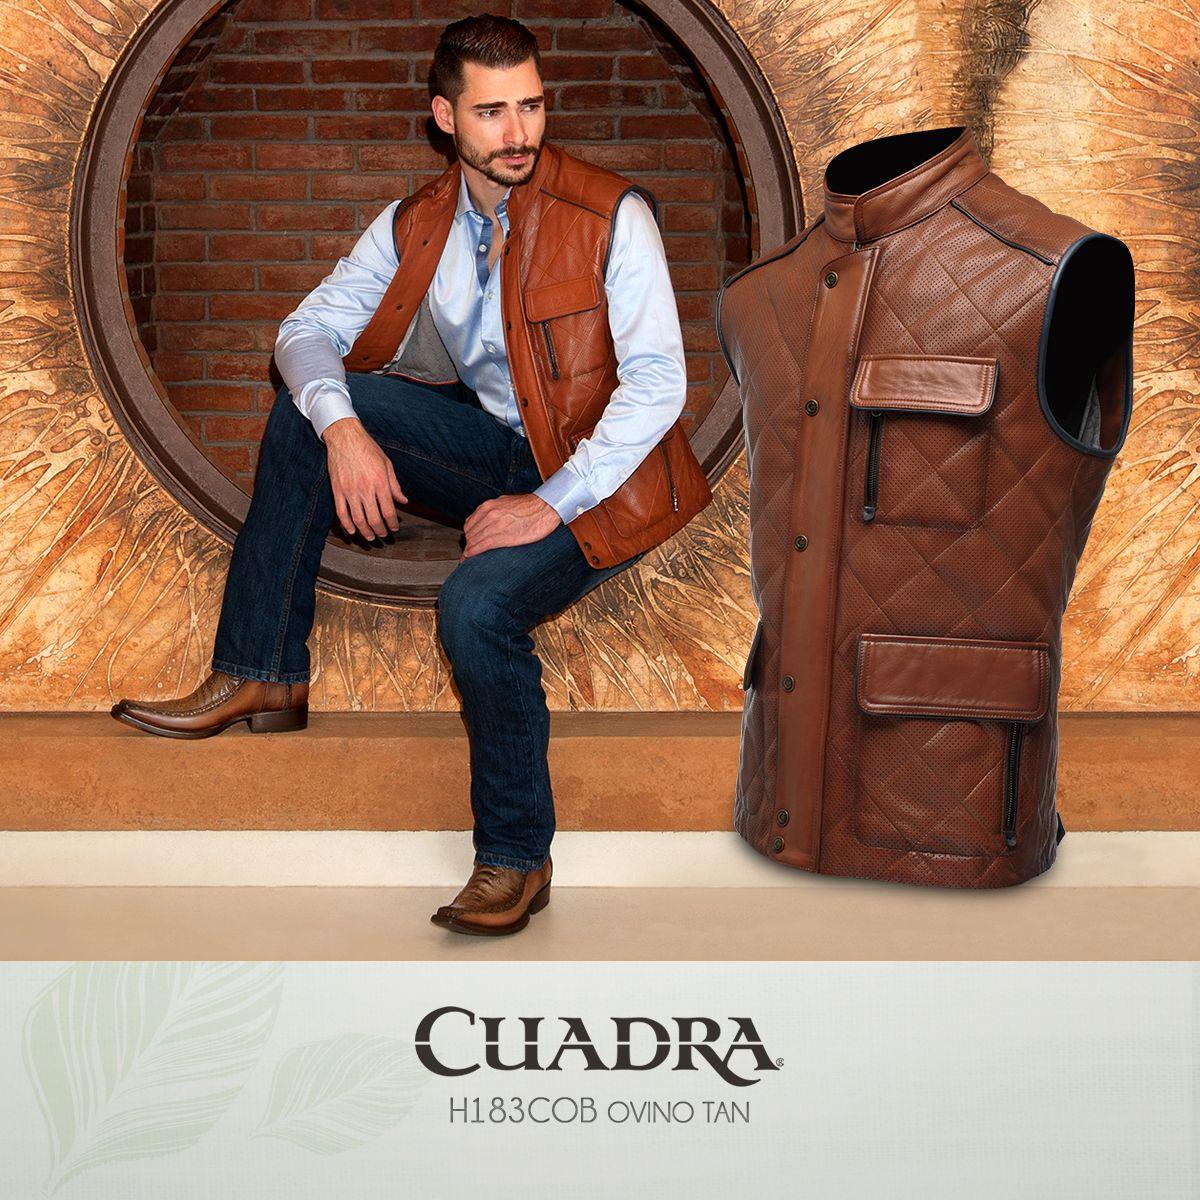 548605d82 Vestir bien es sinónimo de CUADRA.  Chaleco  Hombre  Moda